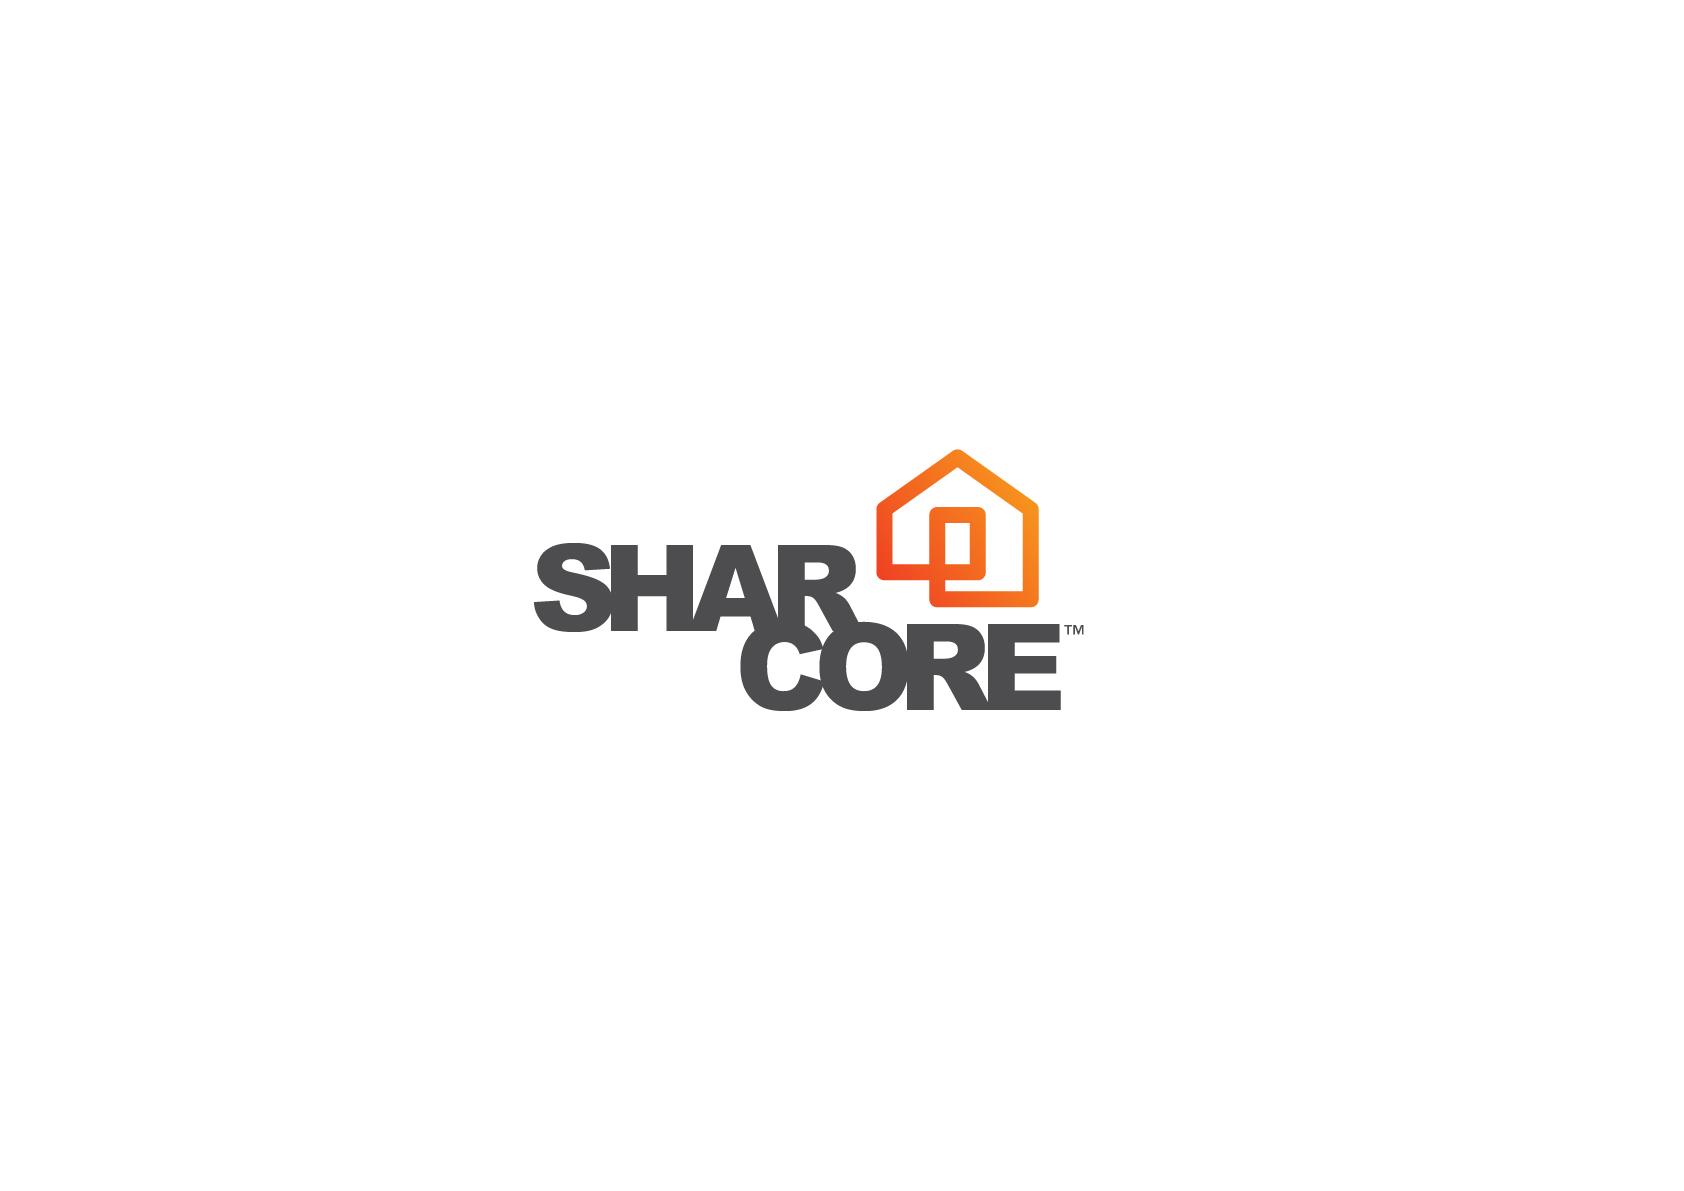 Sharcore - Artboard 1.jpg